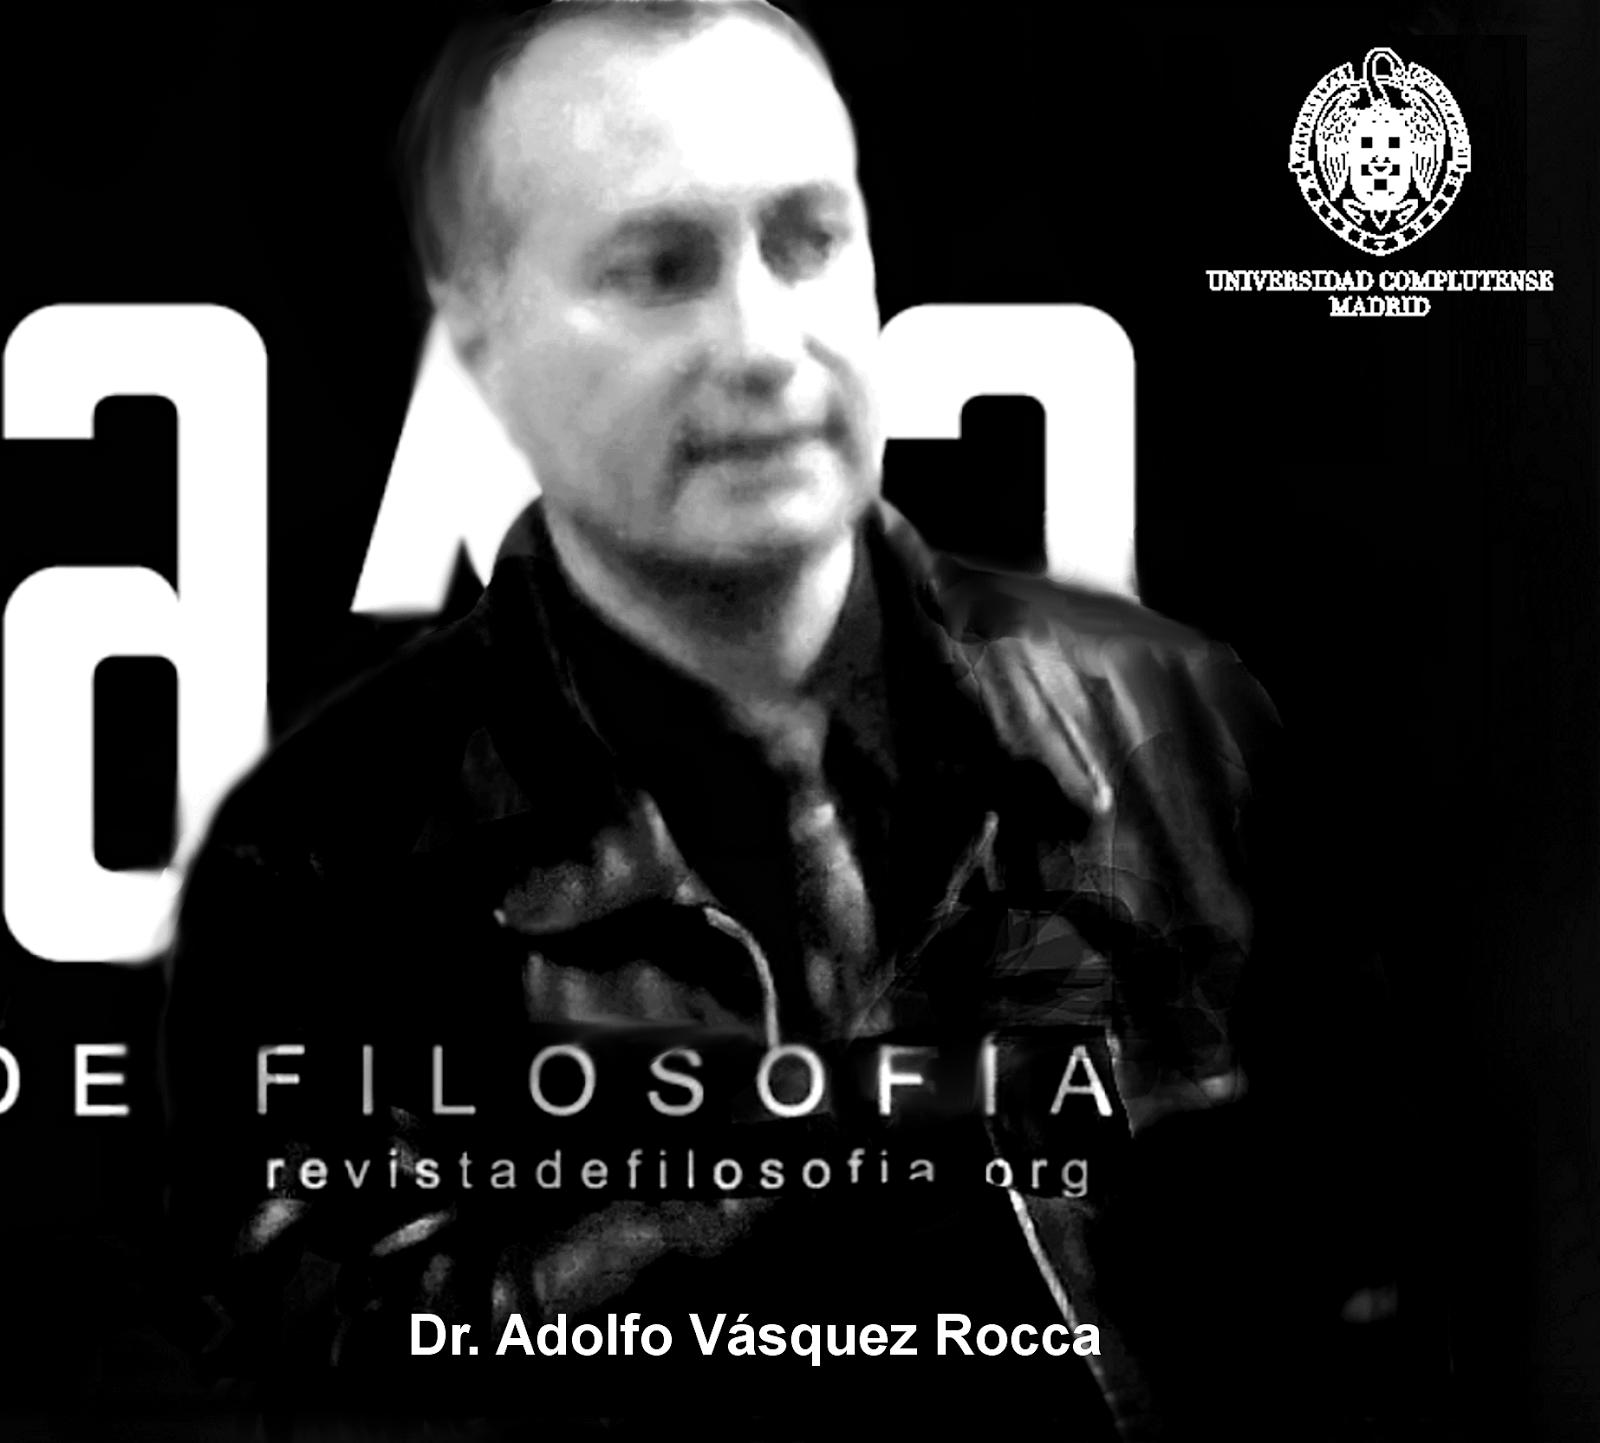 http://3.bp.blogspot.com/-nX3jyDlkZME/UmK8LWbNX-I/AAAAAAAALR4/H4uUXlv0Ivo/s1600/Adofo+Vasquez+Rocca++PHD.+2.0+bn+_+Revista+Eikasia+_+Sociedad+Asturiana+de+Filosof%C3%ADa+7000+BN+individual.png